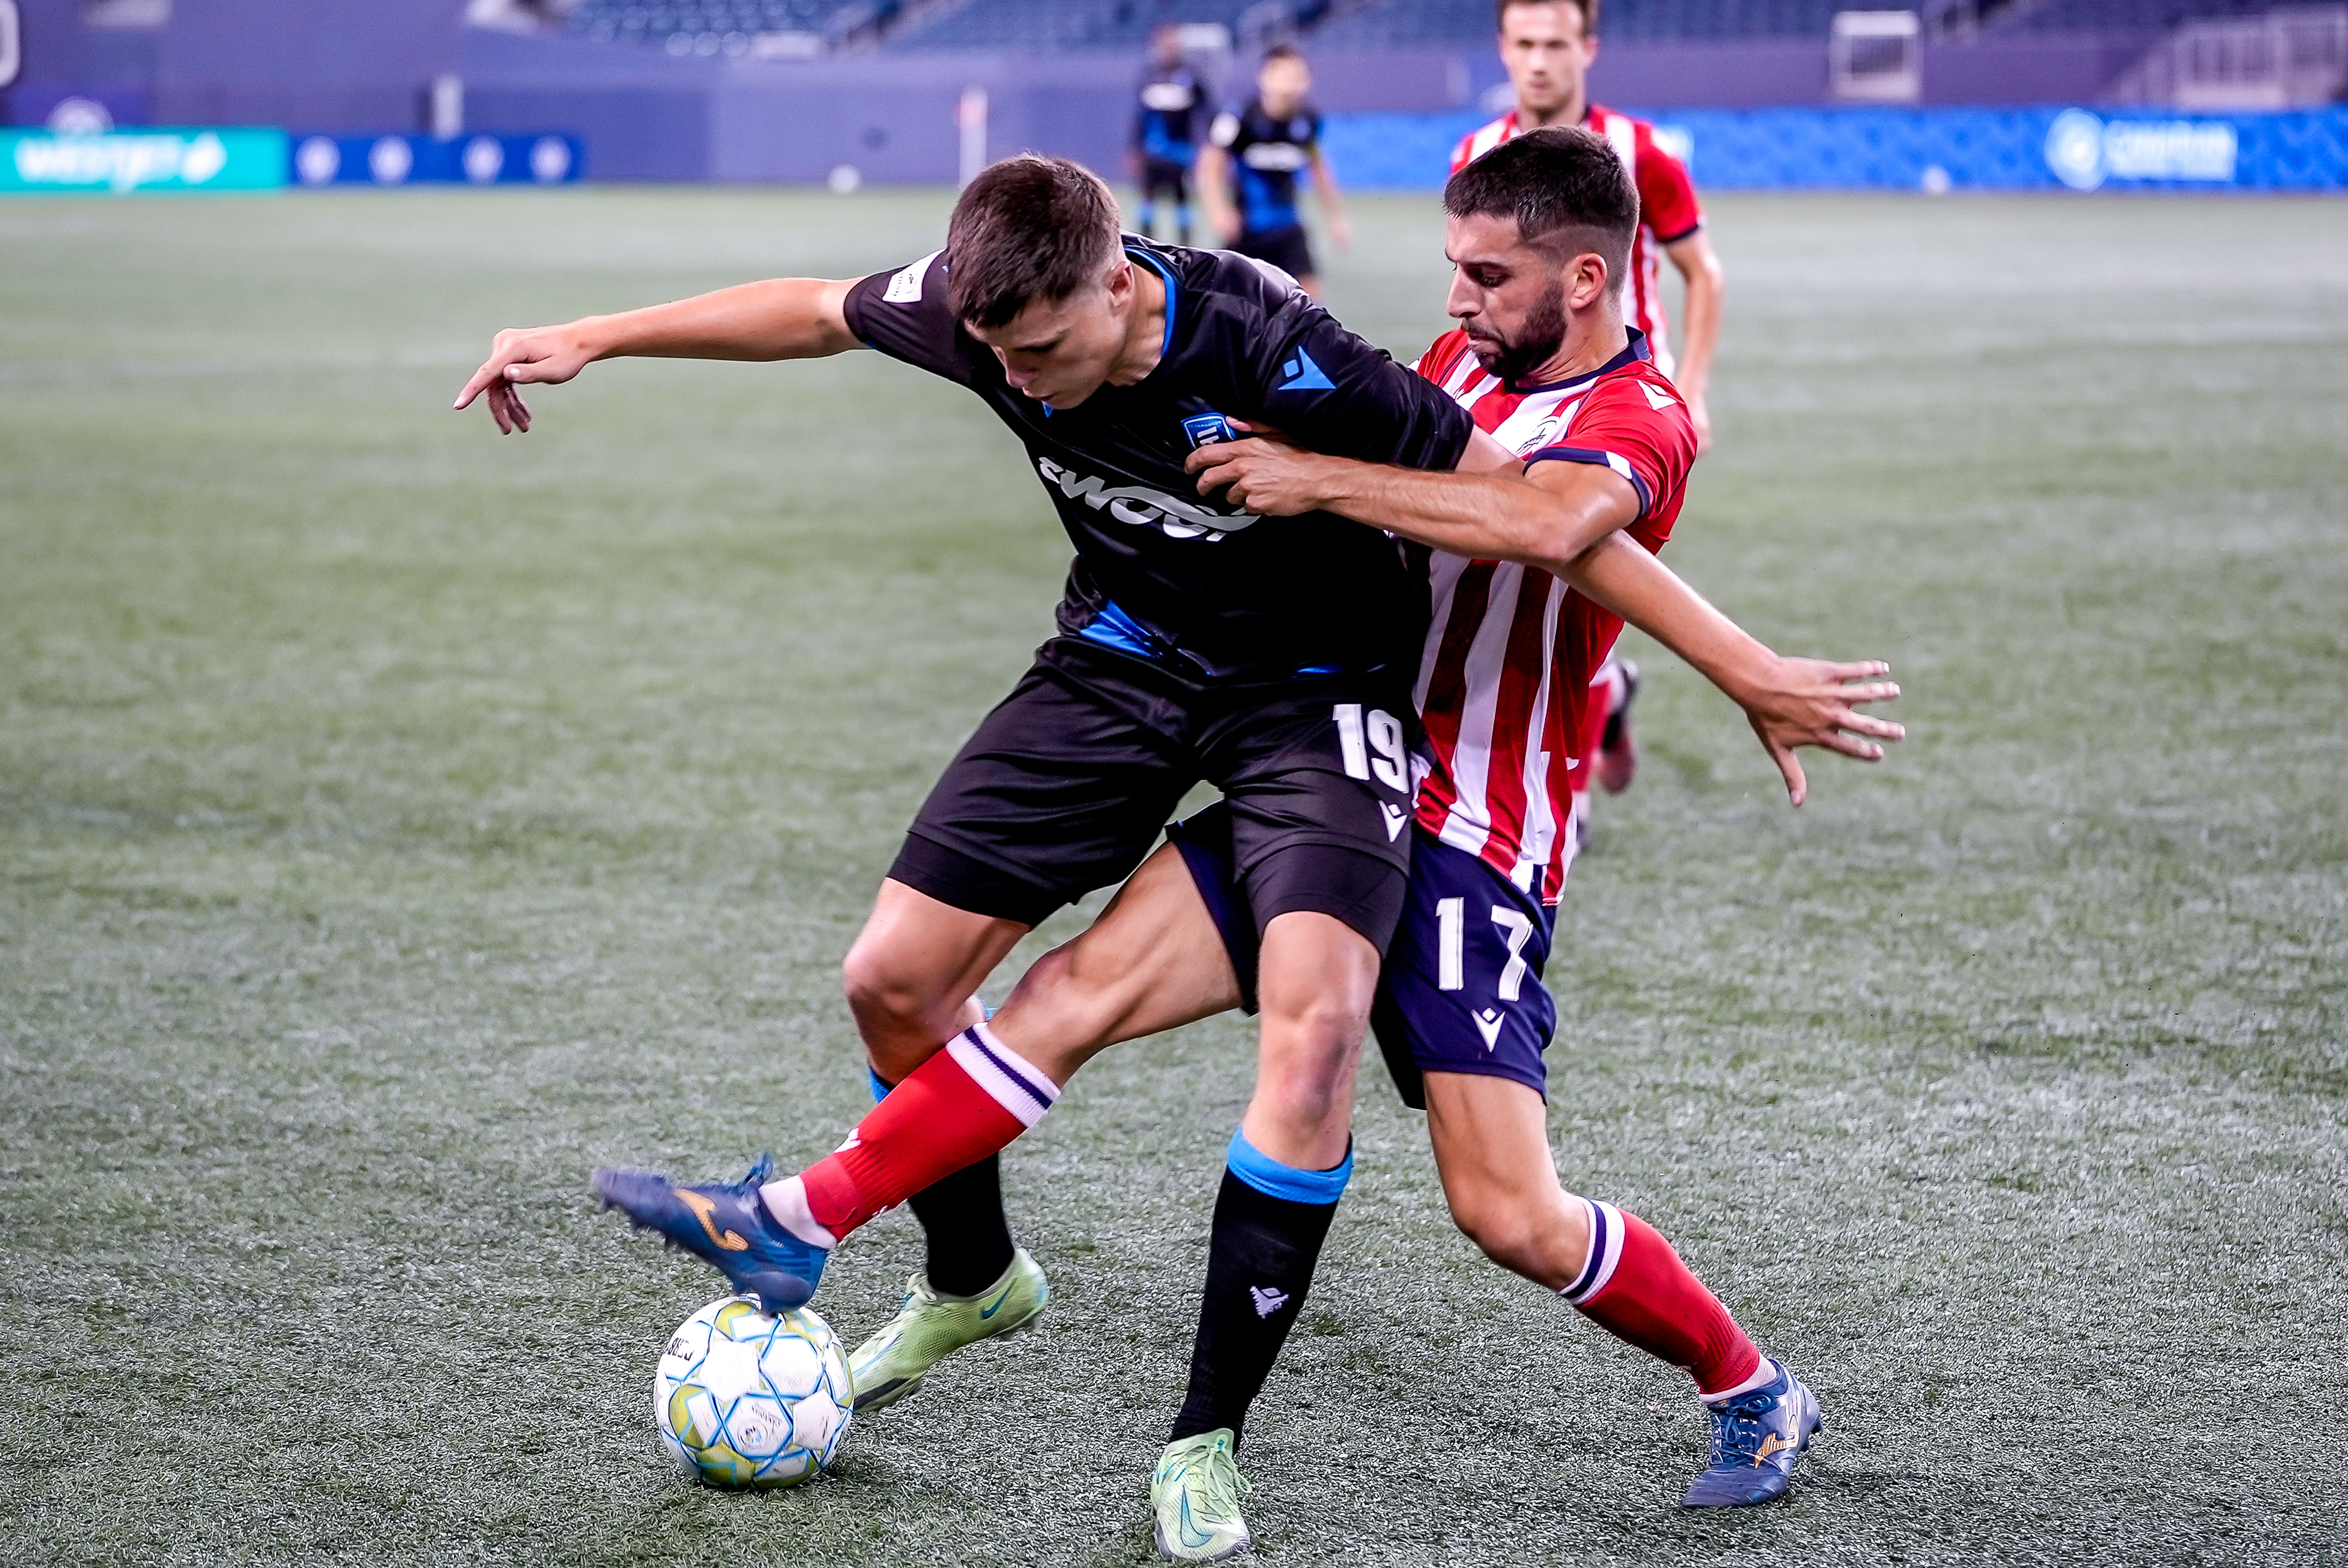 July 18, 2021. Atlético Ottawa vs FC Edmonton. Second-Half. Tobias Warschewski of FC Edmonton keeps the ball away from Miguel Acosta of Atlético Ottawa.